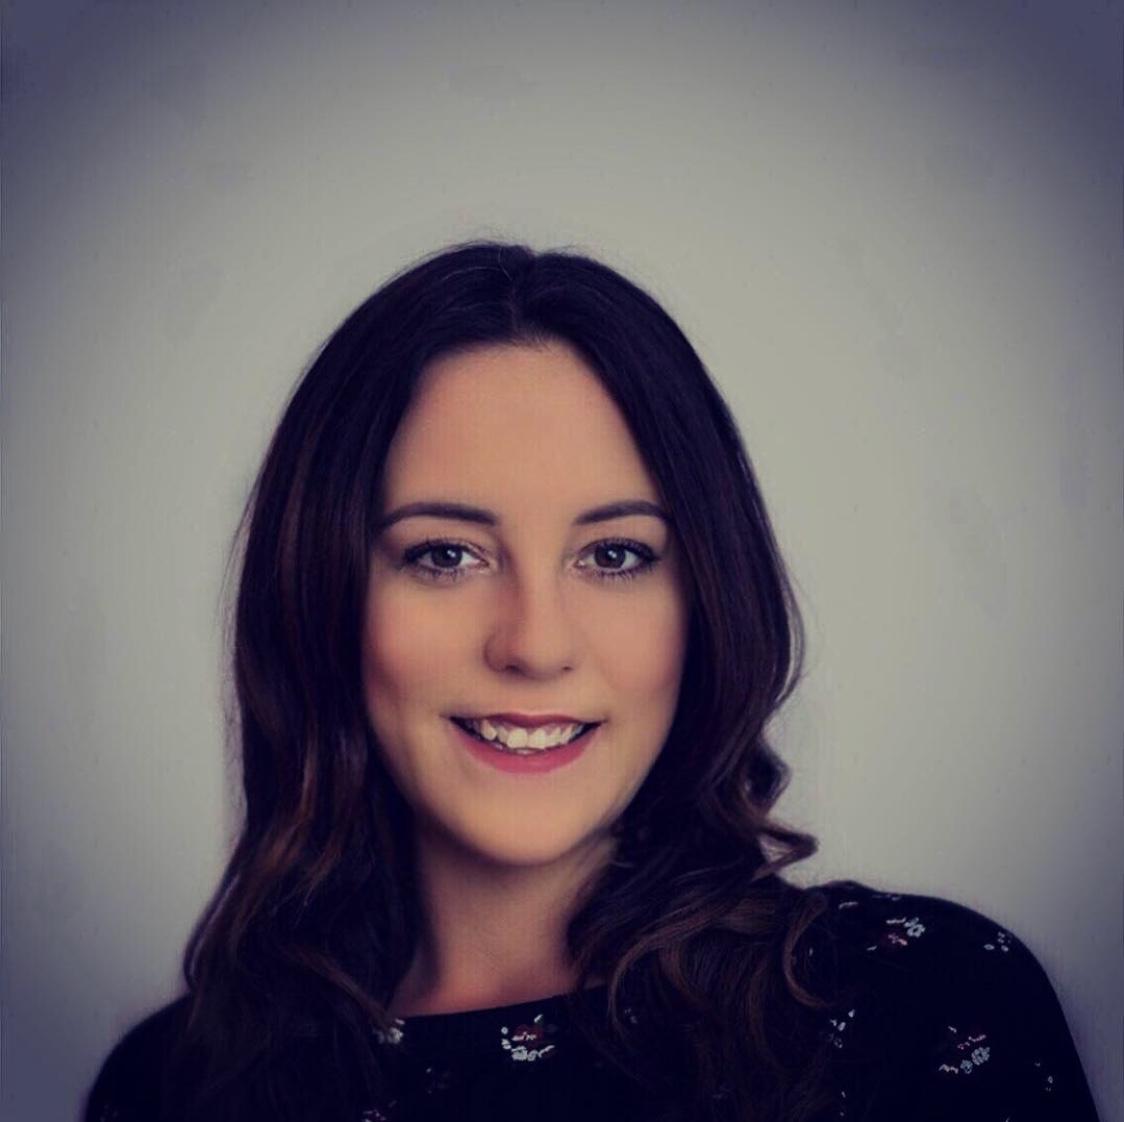 Louise McBride